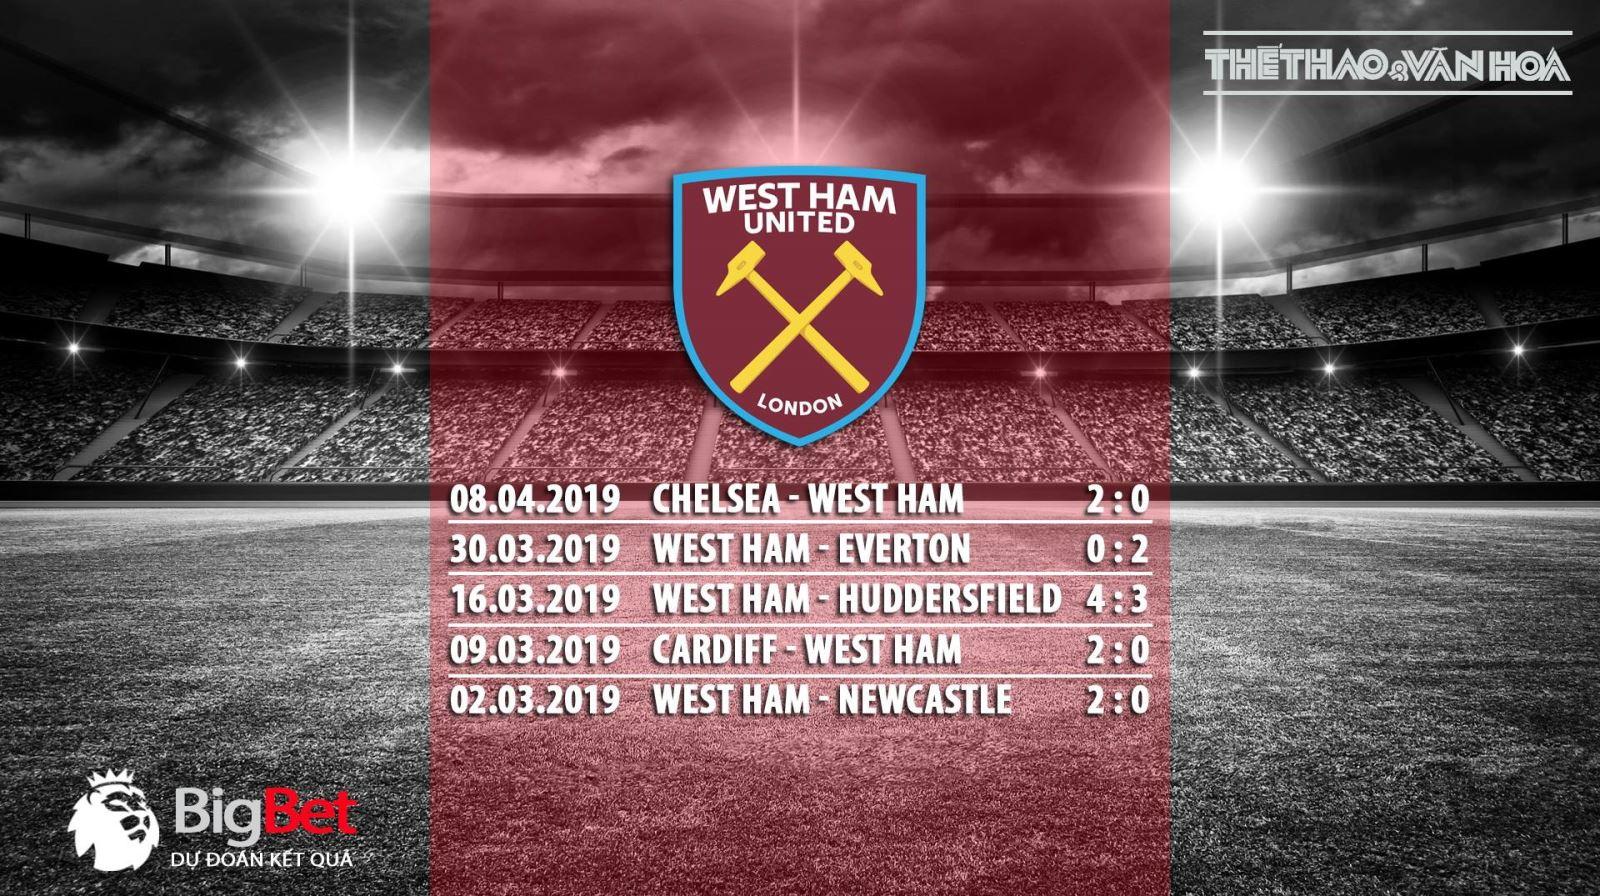 MU vs West Ham, soi keo MU vs West Ham, MU, West Ham, keo MU, truc tiep MU vs West Ham, truc tiep bong da, keo bong da, lich thi dau ngoai hang anh, ngoai hang anh, xem bong da truc tuyen